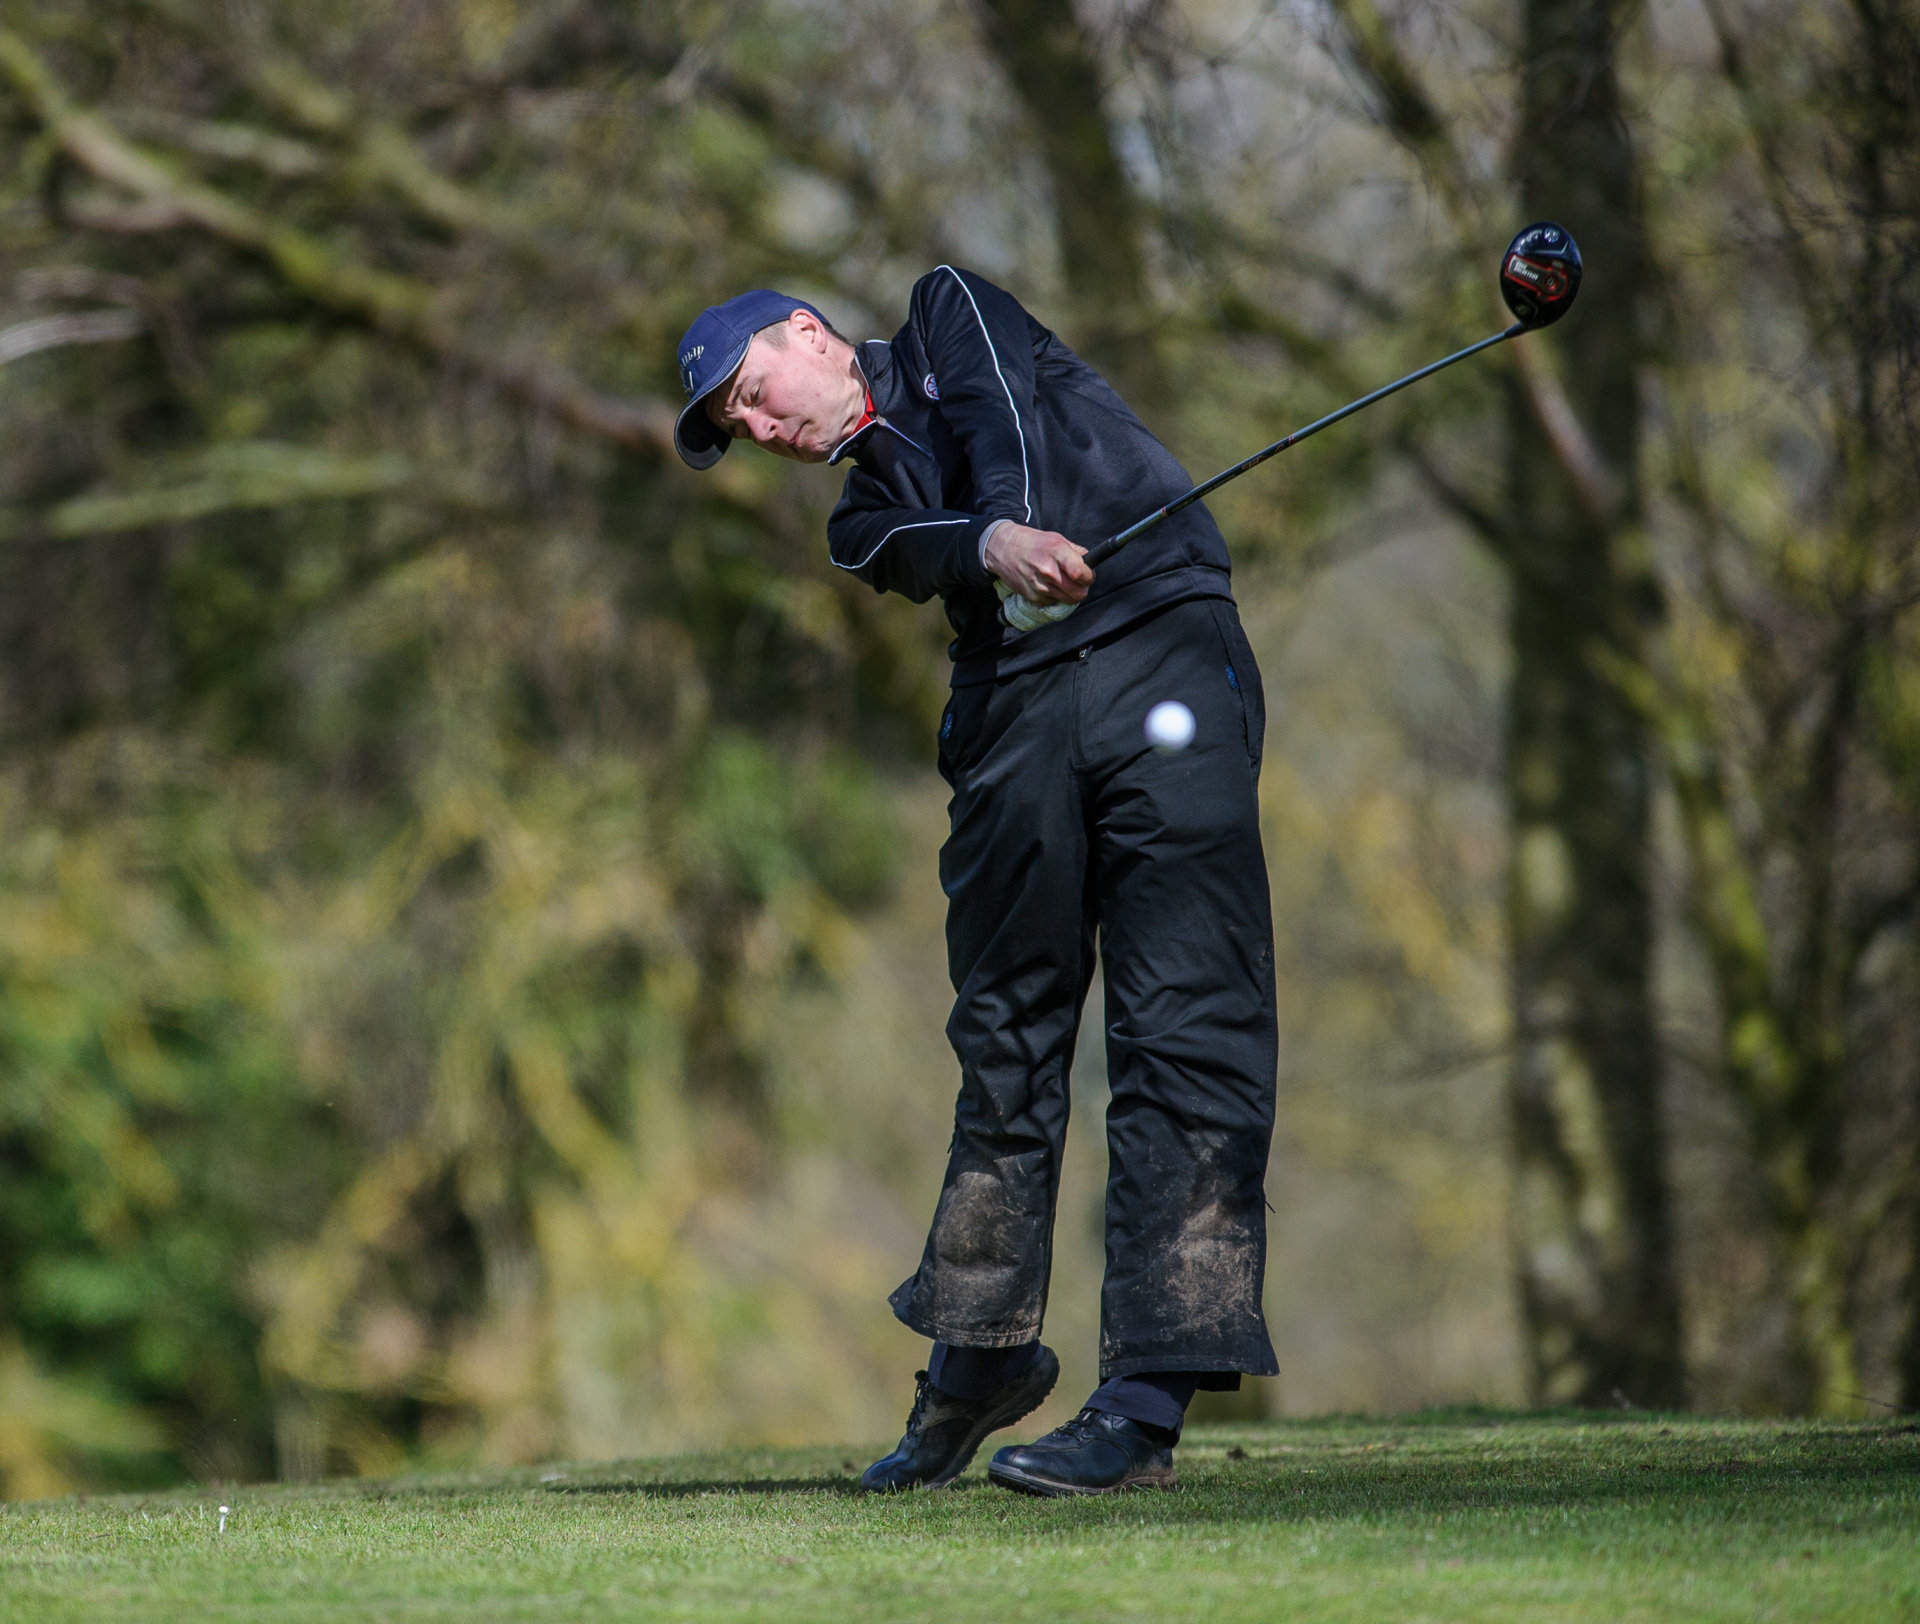 Kevindiss.com golf course photography Hawkstone Park golf course-2818.jpg